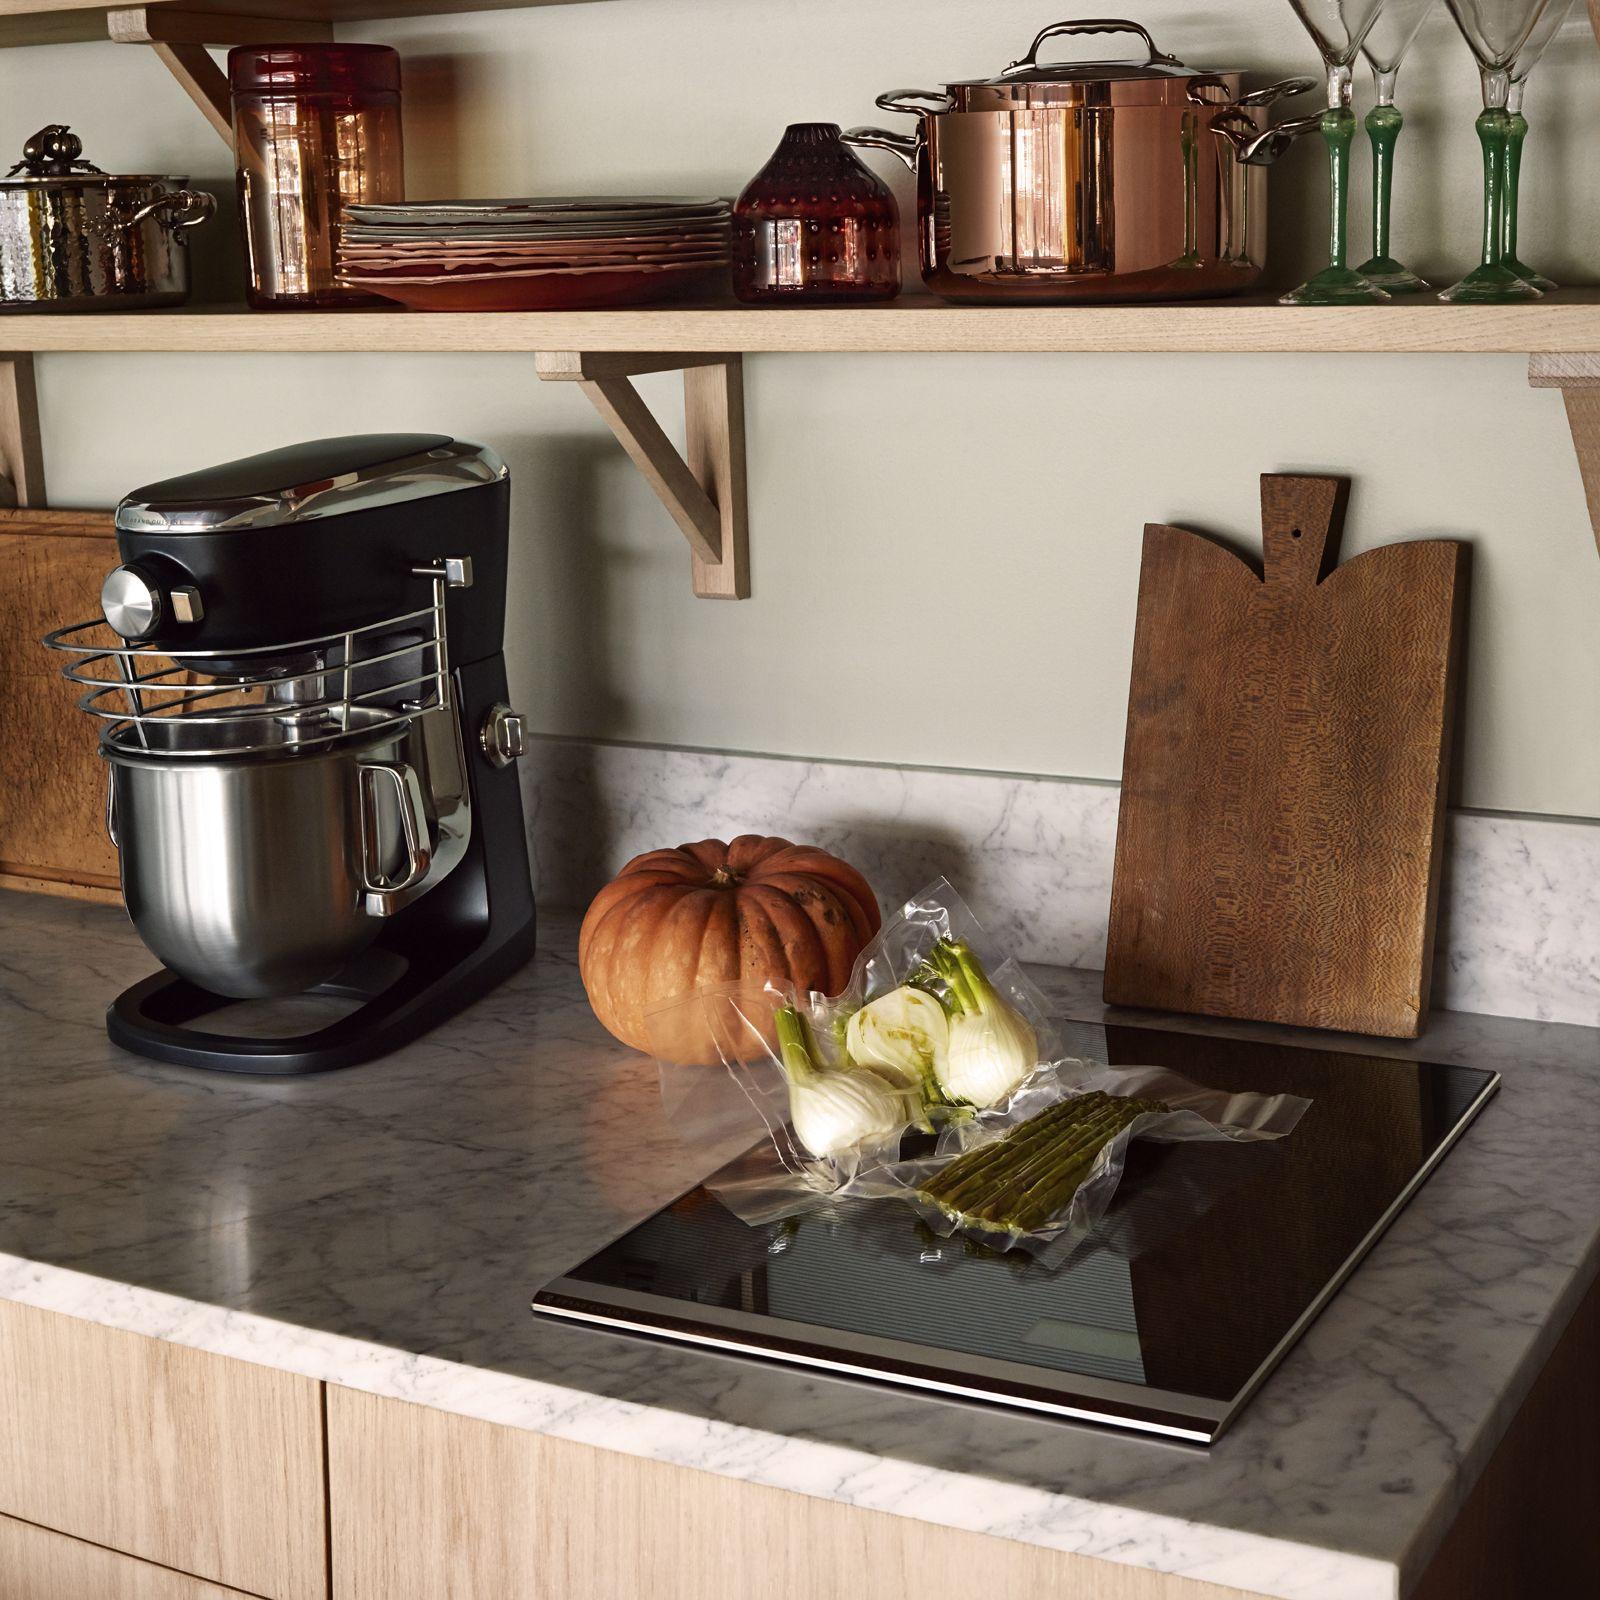 with grand cuisine presicion vacuum sealer you preserve the taste moisture and texture